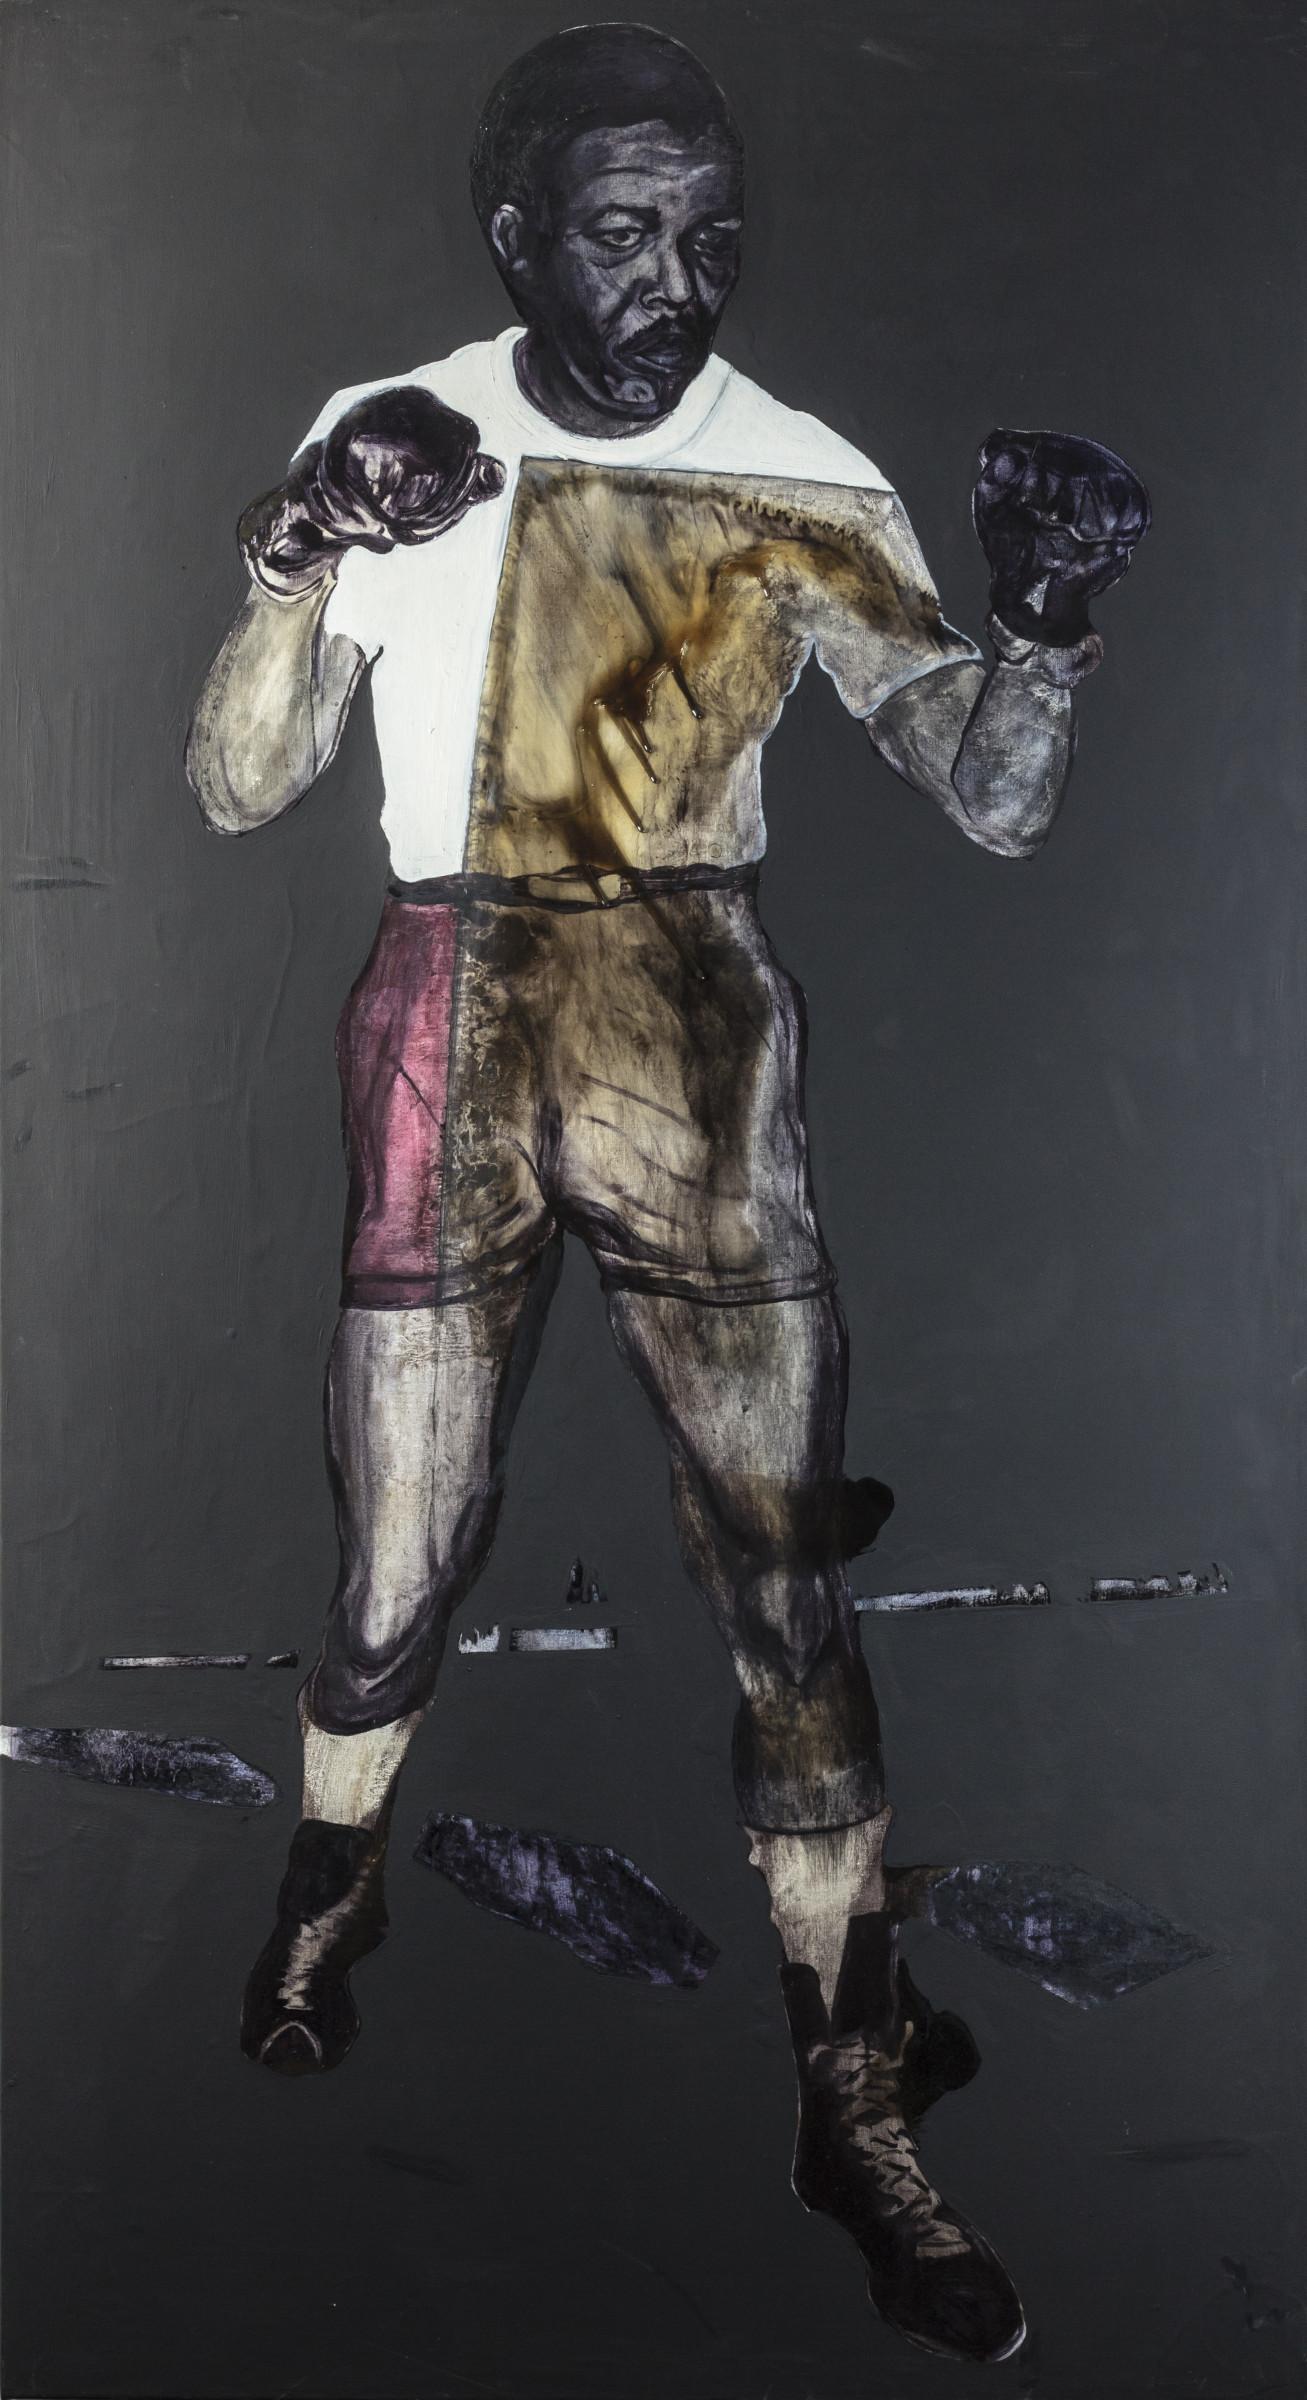 <span class=&#34;link fancybox-details-link&#34;><a href=&#34;/exhibitions/14/works/artworks4988/&#34;>View Detail Page</a></span><div class=&#34;medium&#34;>Acryl on canvas</div> <div class=&#34;dimensions&#34;>200 x 110 cm</div>